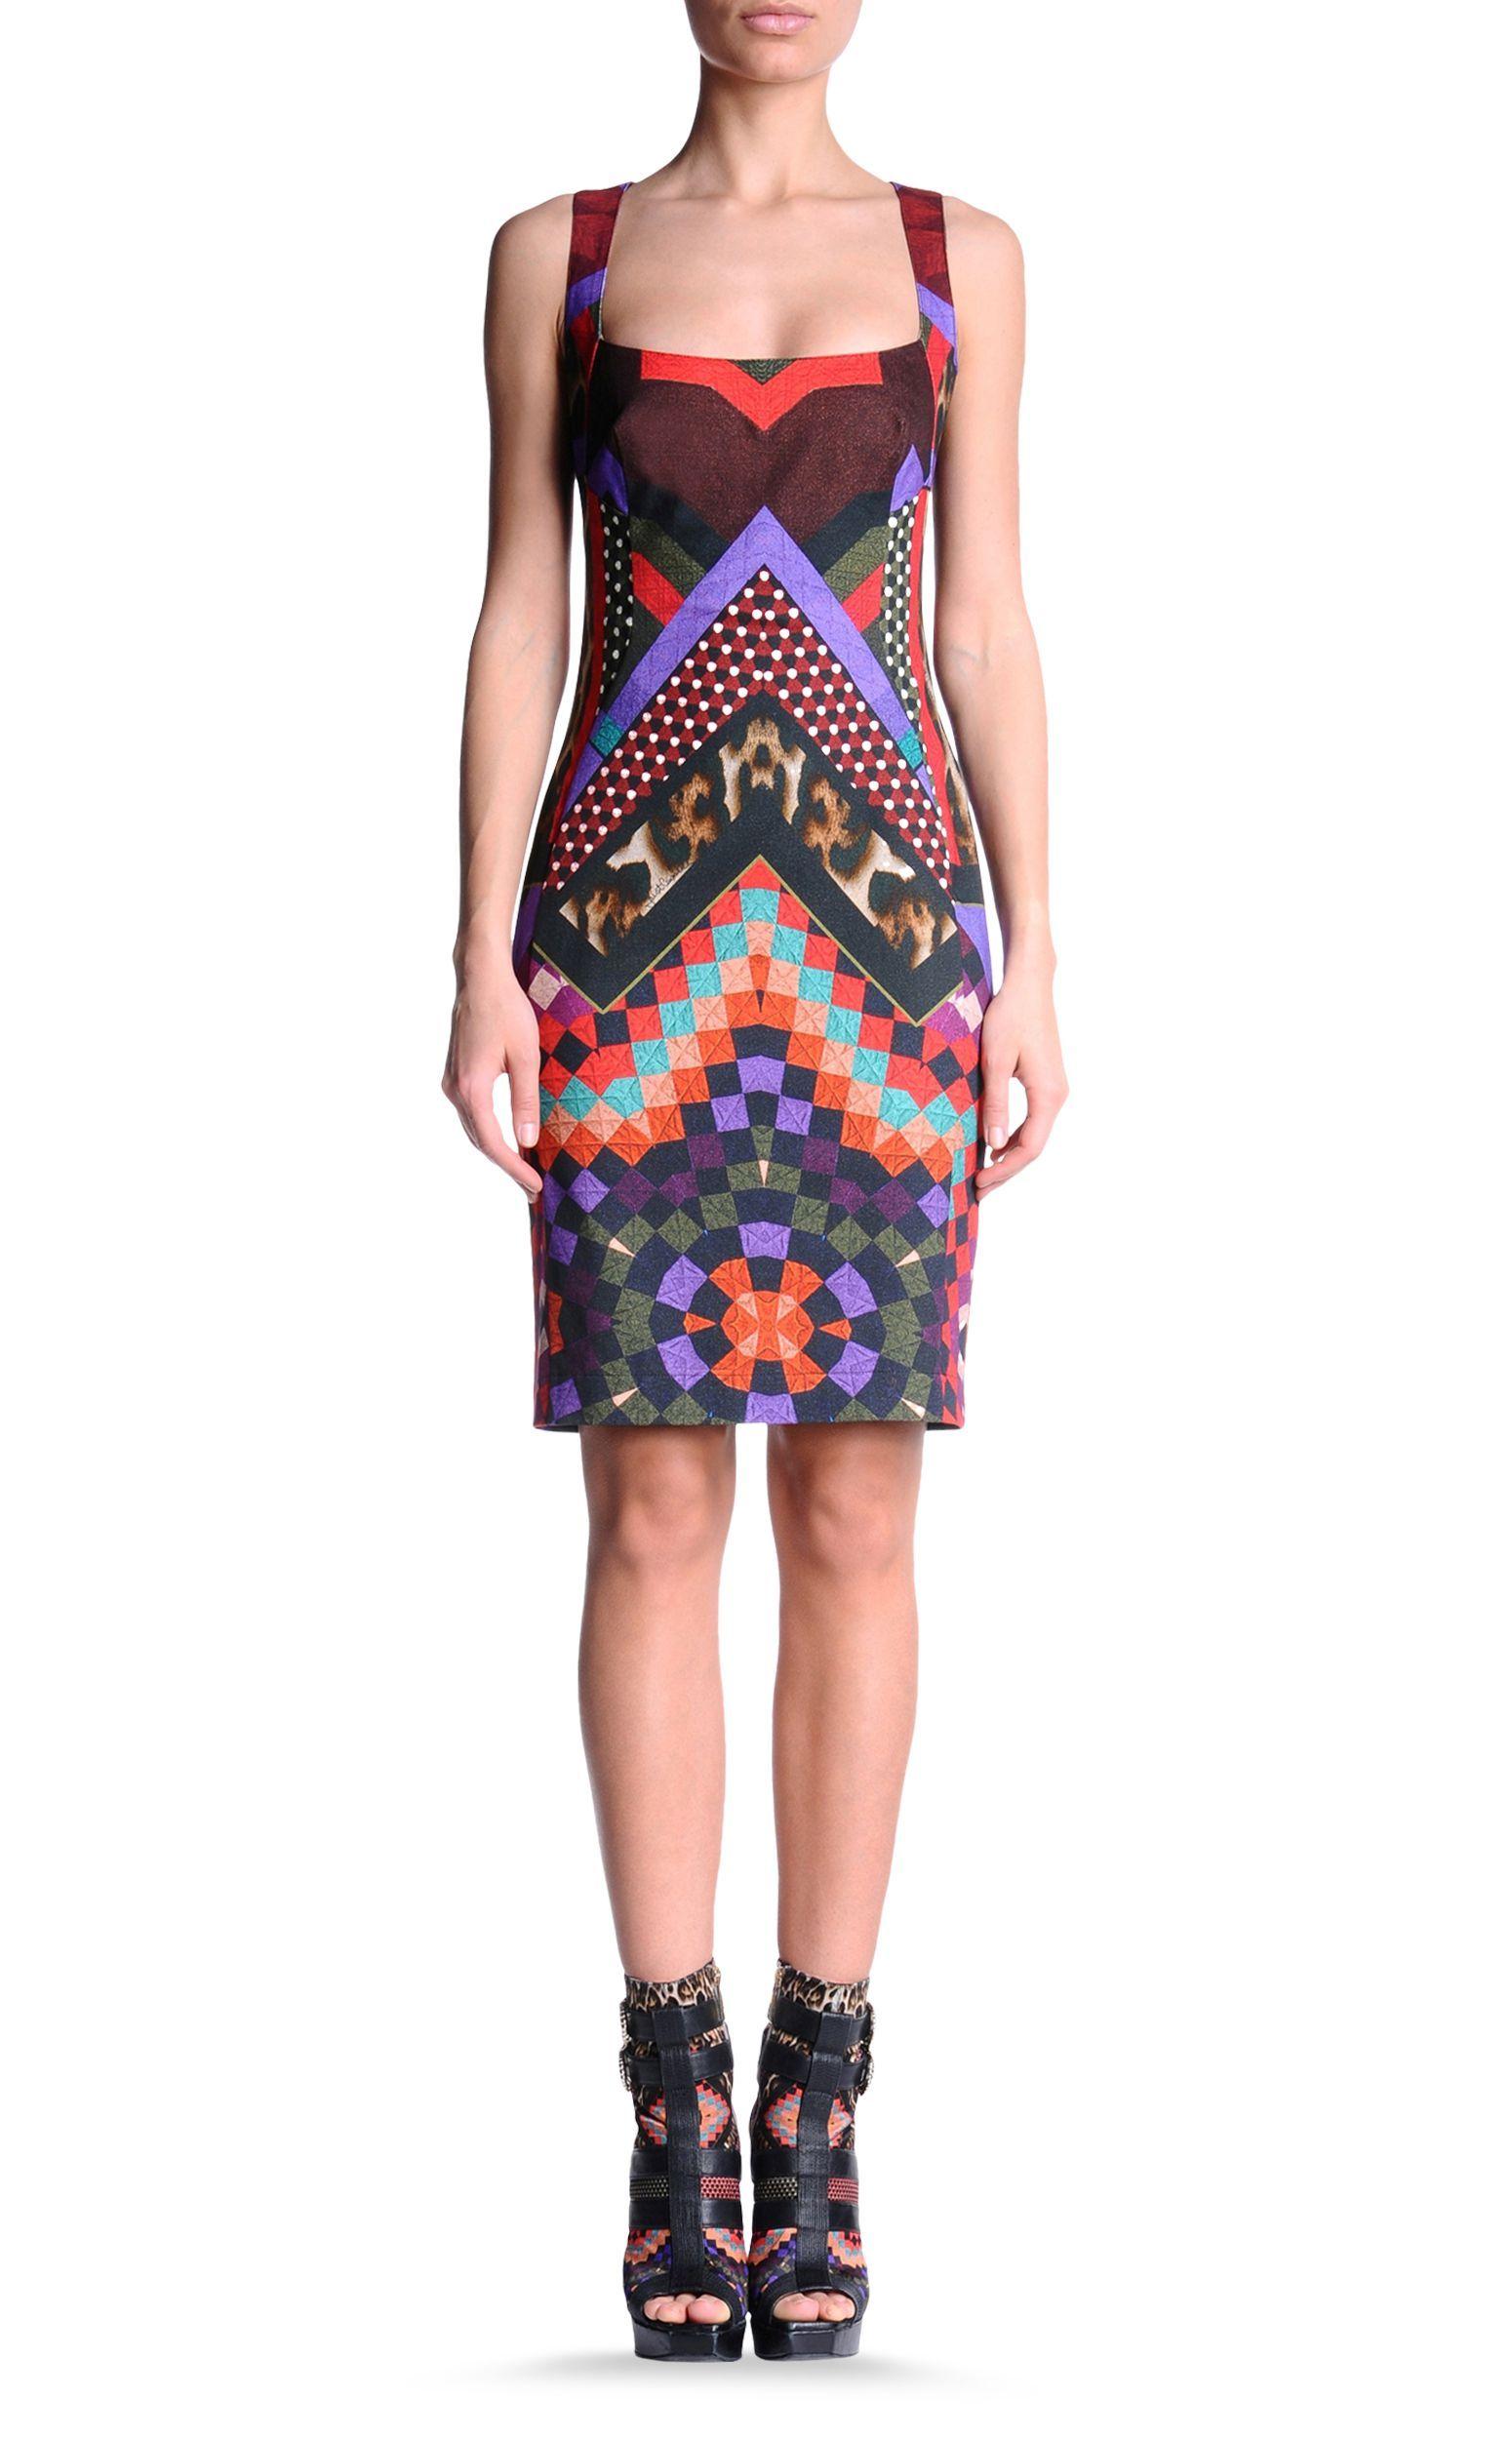 new style 987b4 221ca Short dress Women - Dresses Women on Just Cavalli Online ...